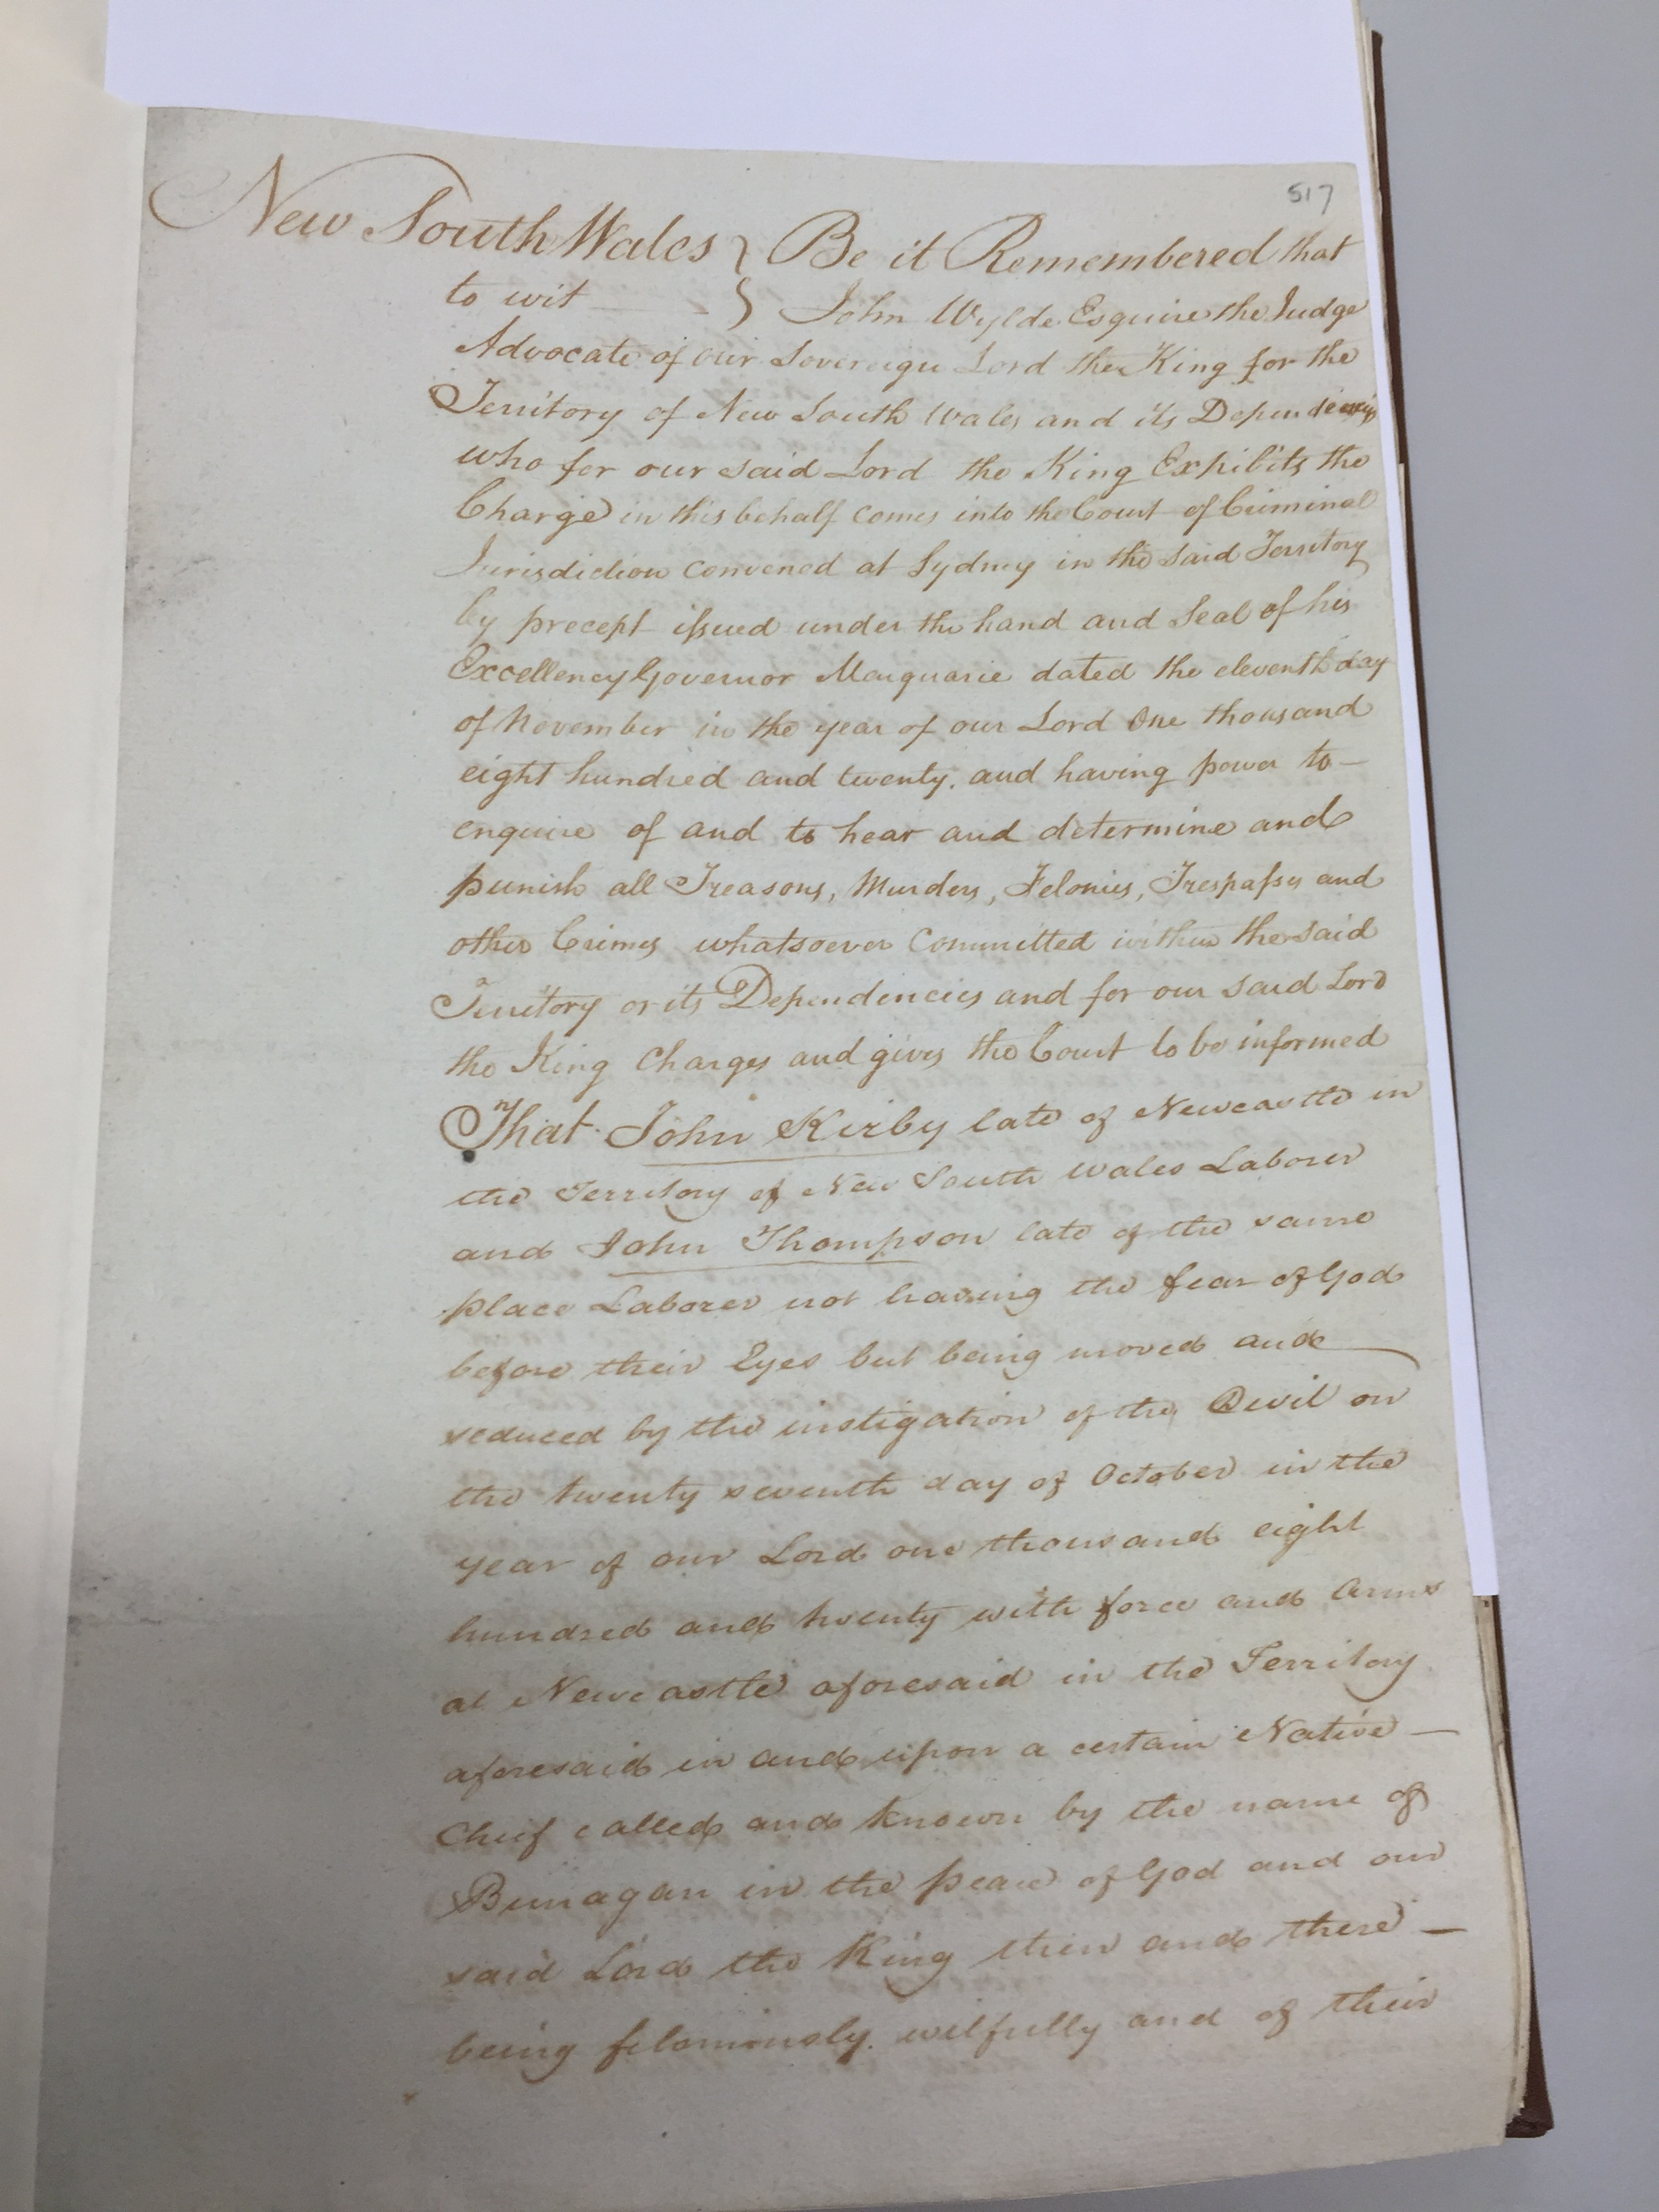 SZ792 p.517 (Image Credit: Fiona Sullivan, State Records NSW)